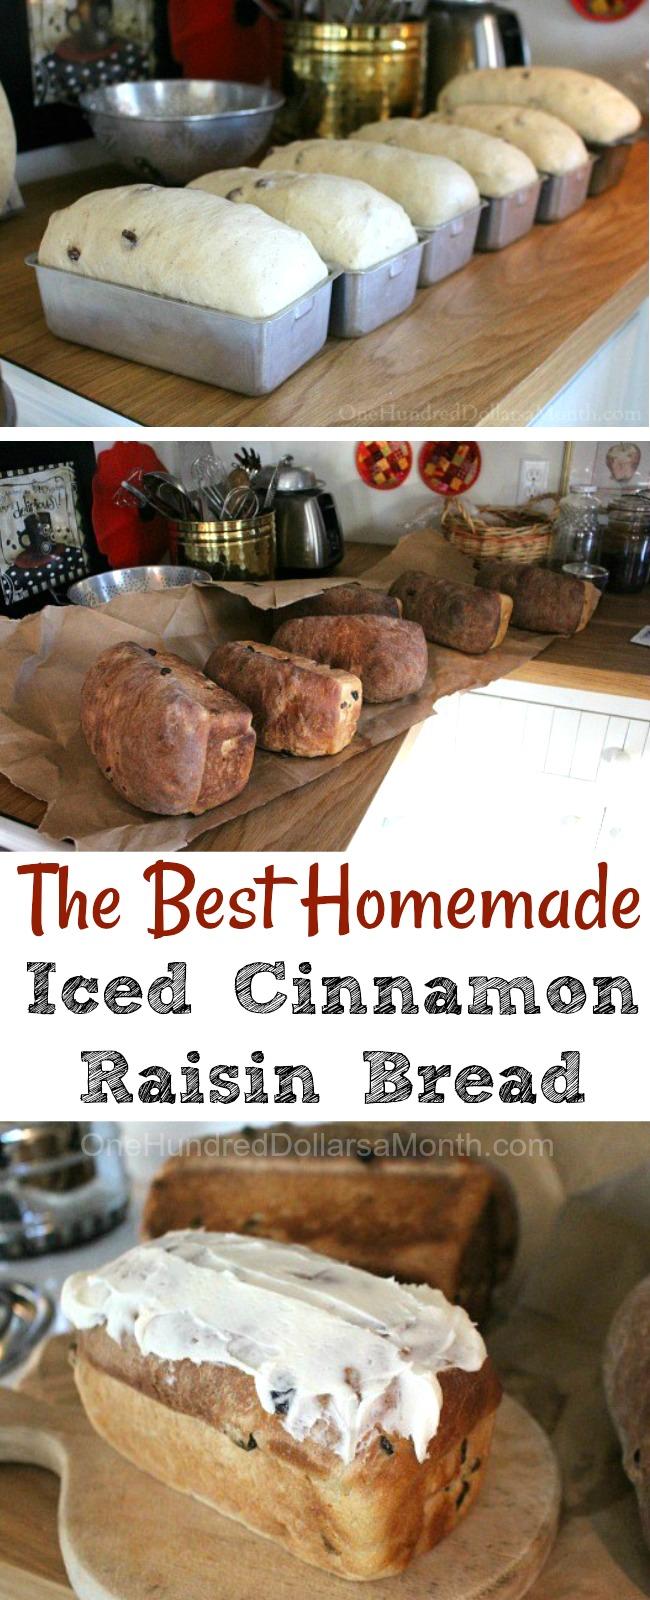 Shirley's Iced Cinnamon Raisin Bread